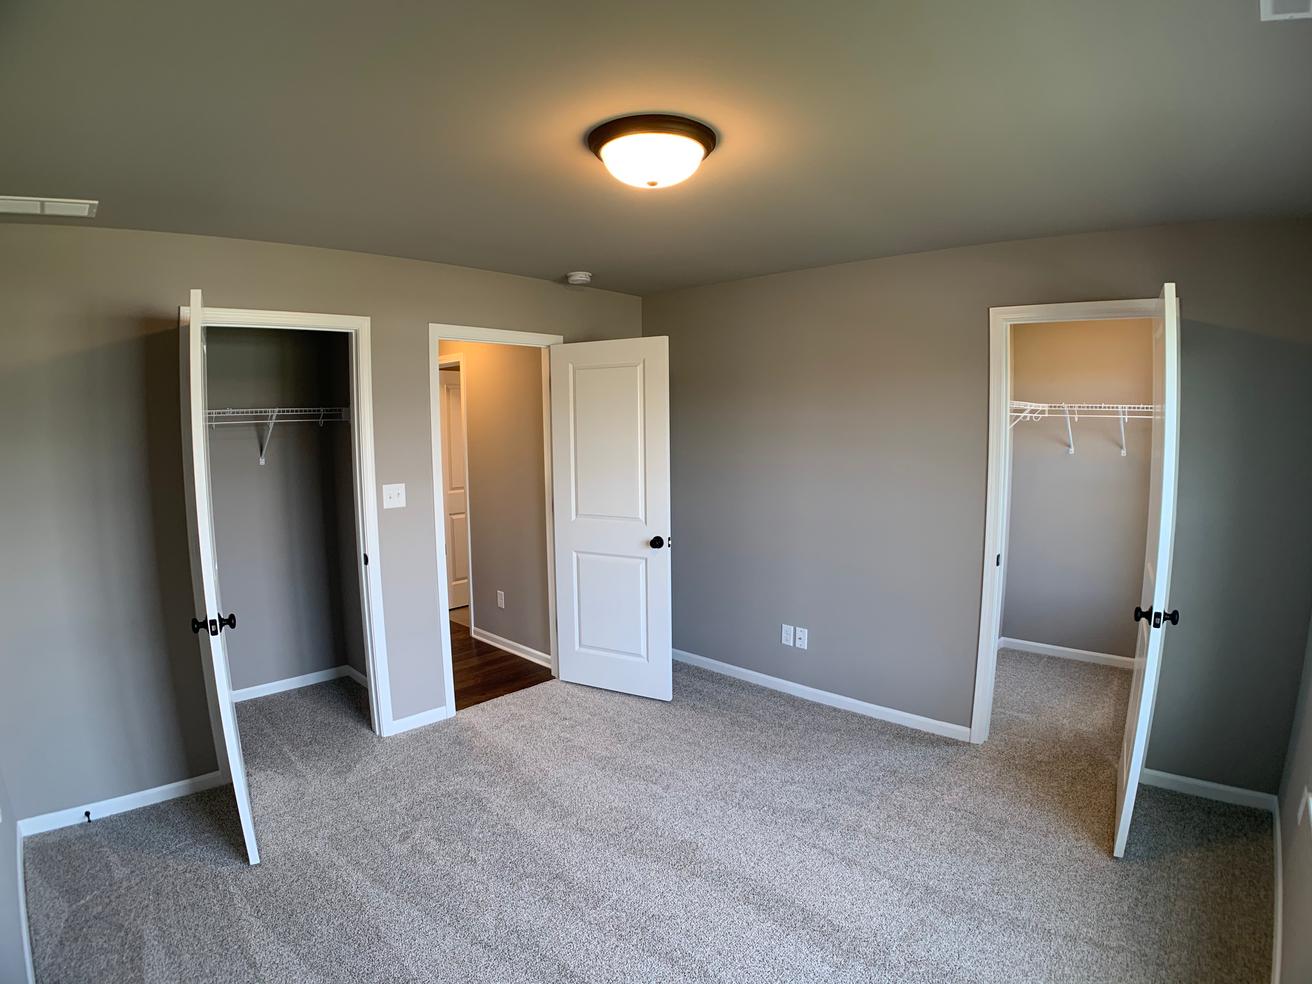 Taylor 3rd Bedroom 2